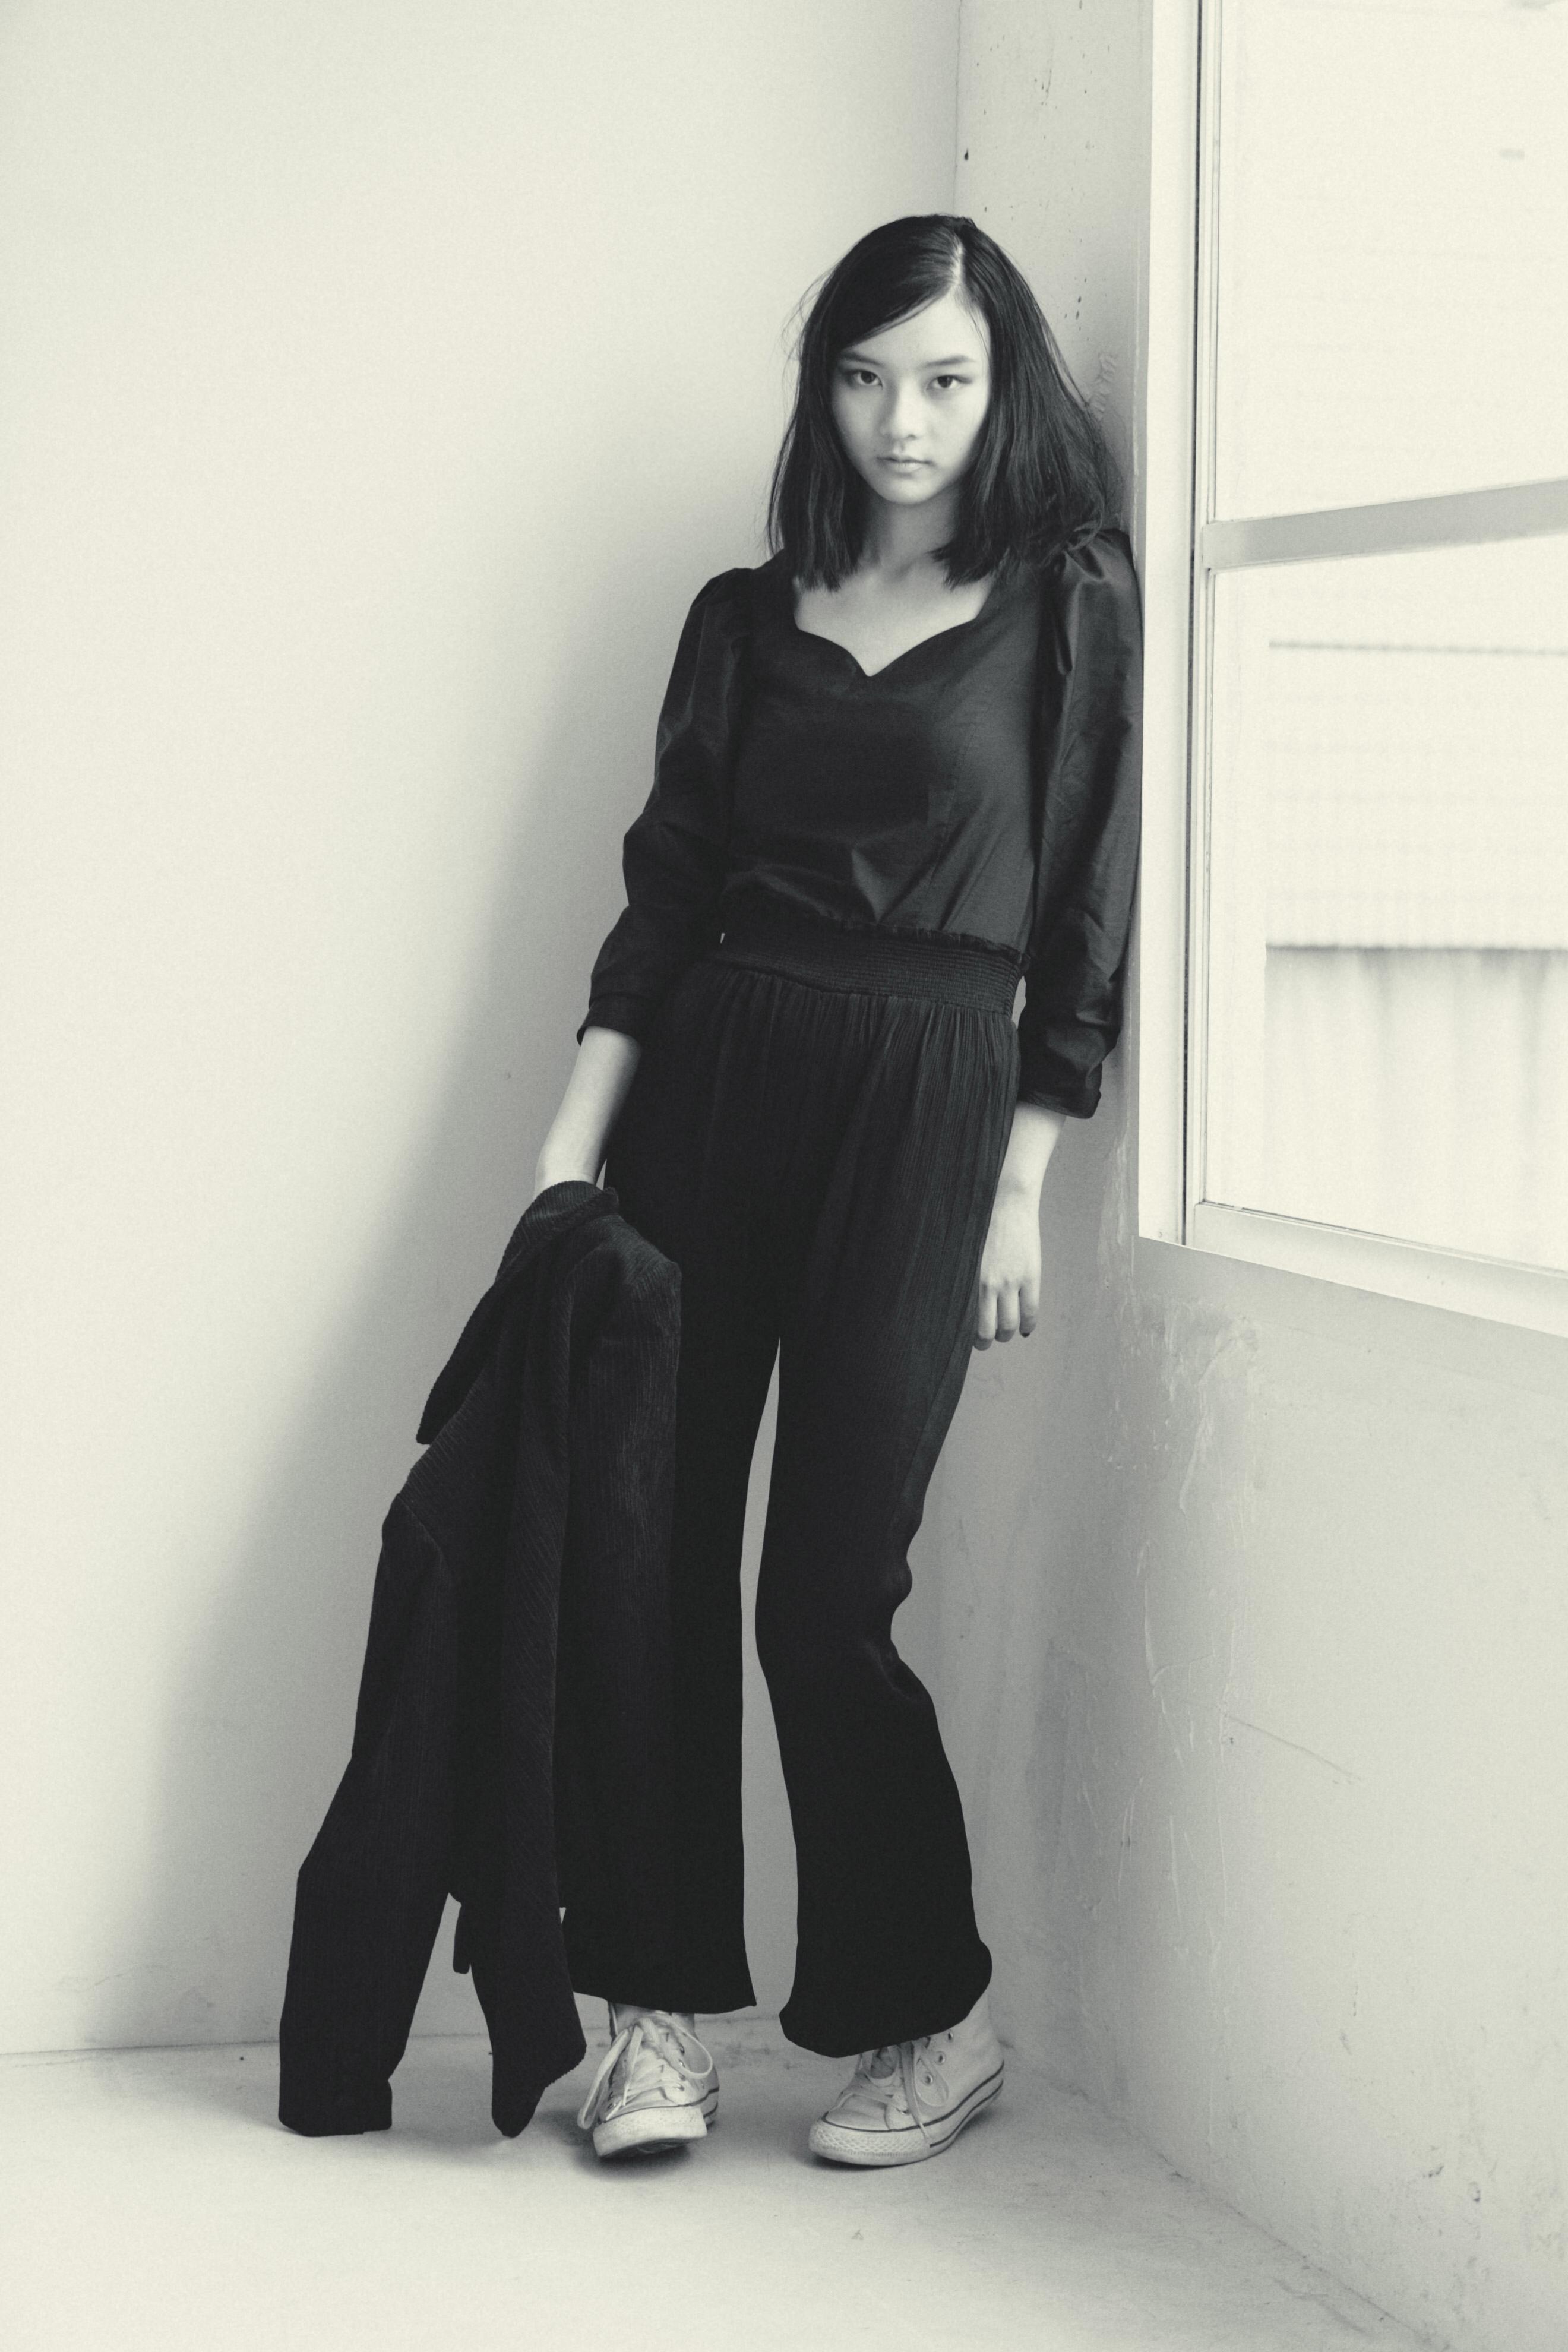 魏新 (AKB48TeamSH)